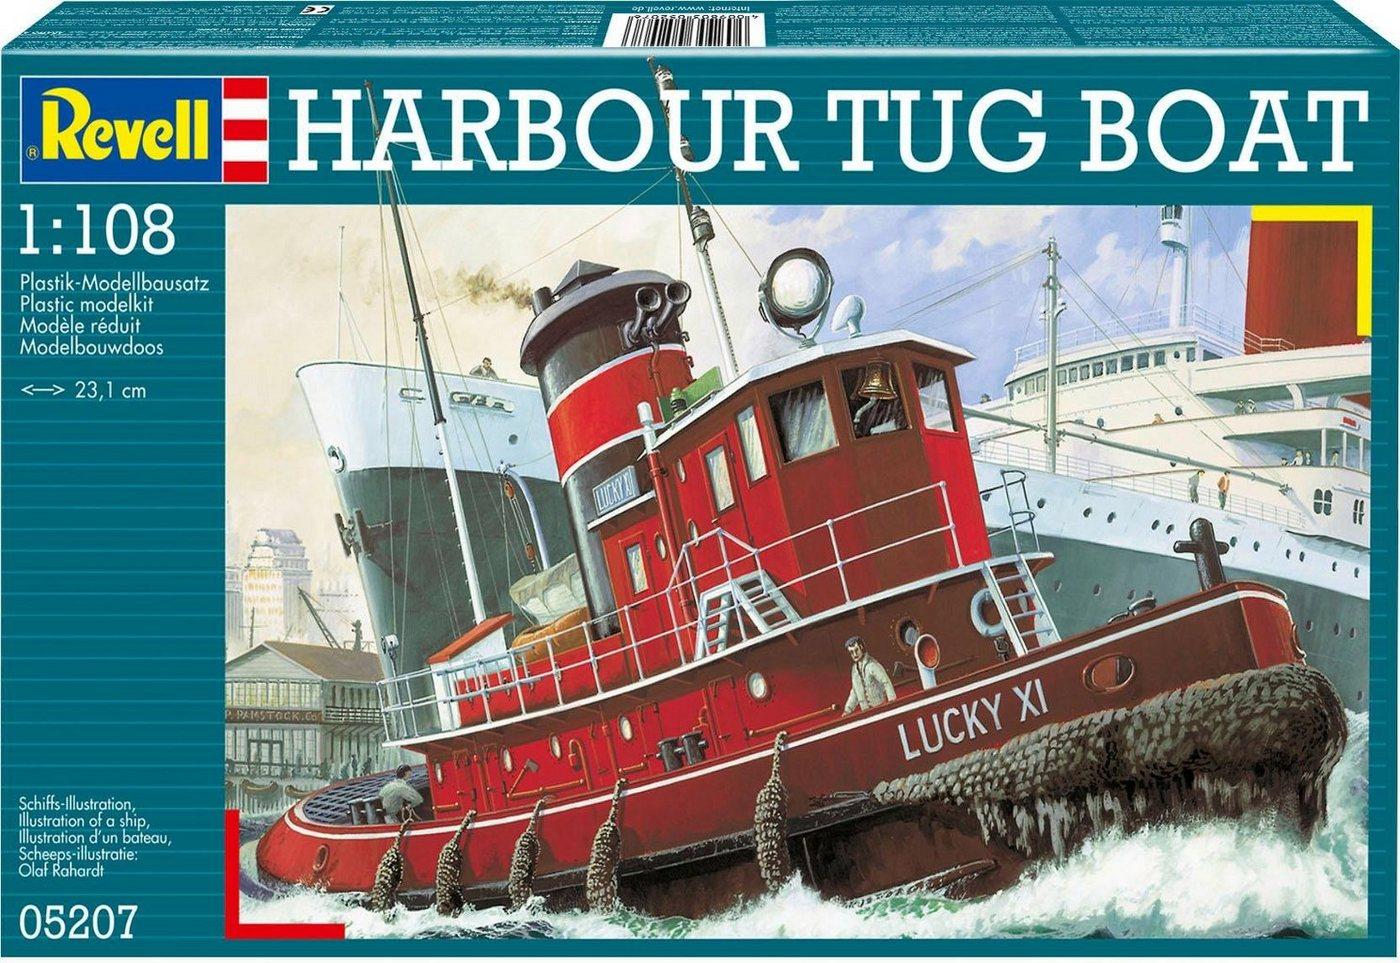 Revell Modellbausatz Schiff mit Zubehör Maßstab 1:108, »Model Set Harbour Tug Boat«